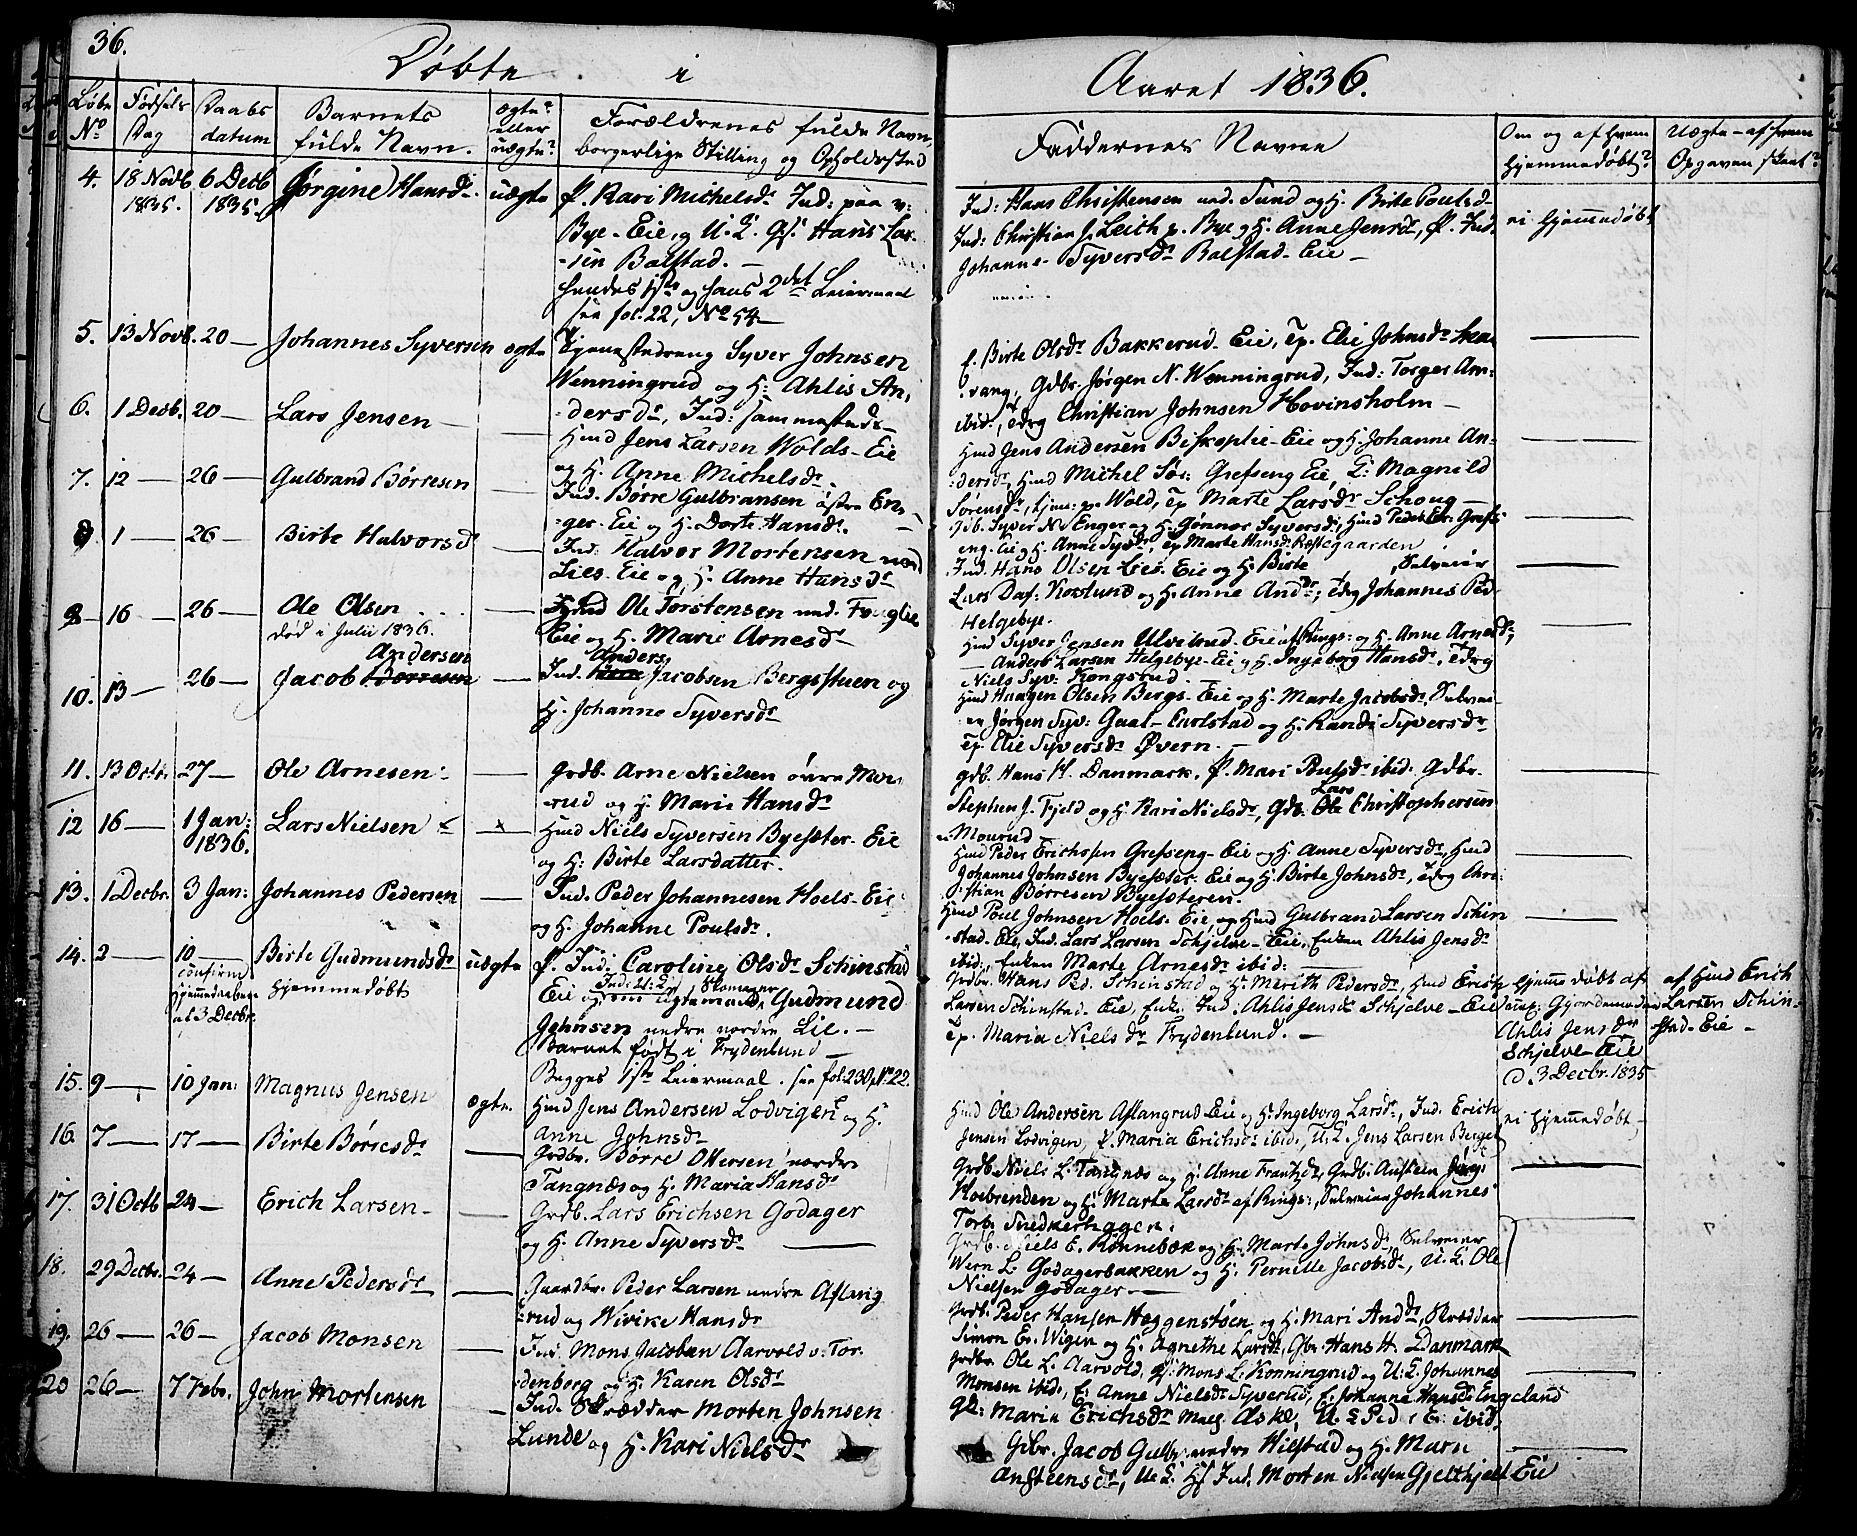 SAH, Nes prestekontor, K/Ka/L0003: Ministerialbok nr. 3, 1827-1851, s. 36